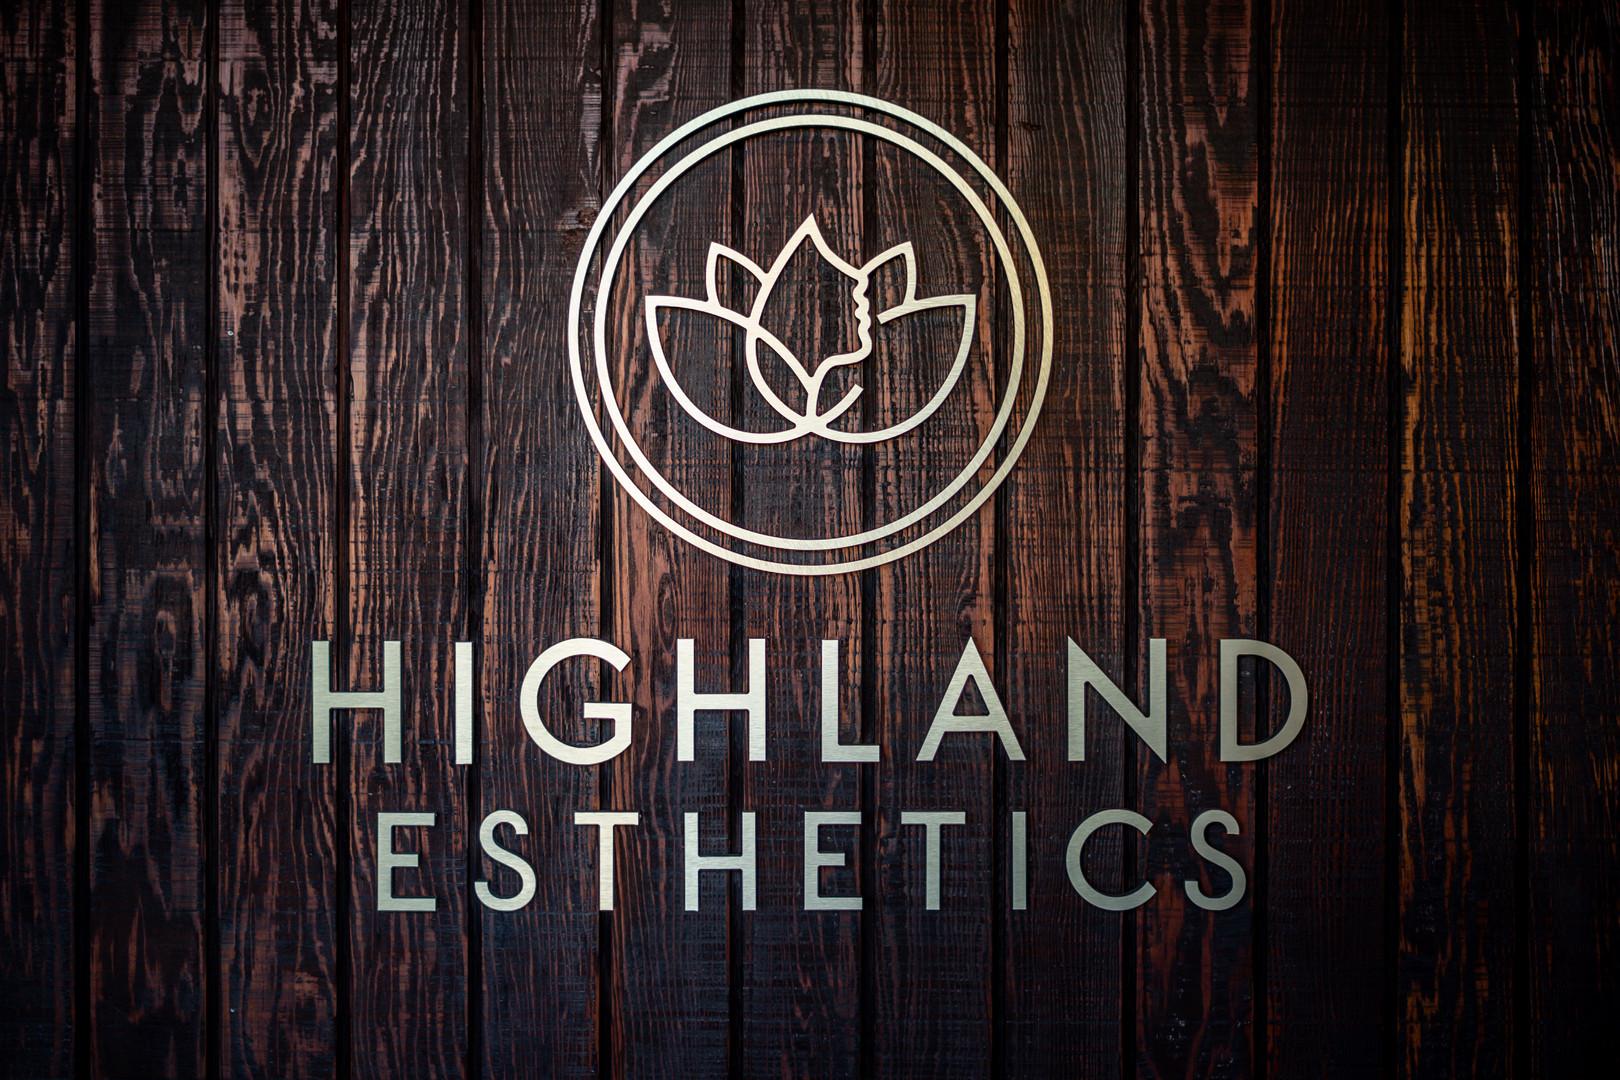 Highland Esthetics Entrance